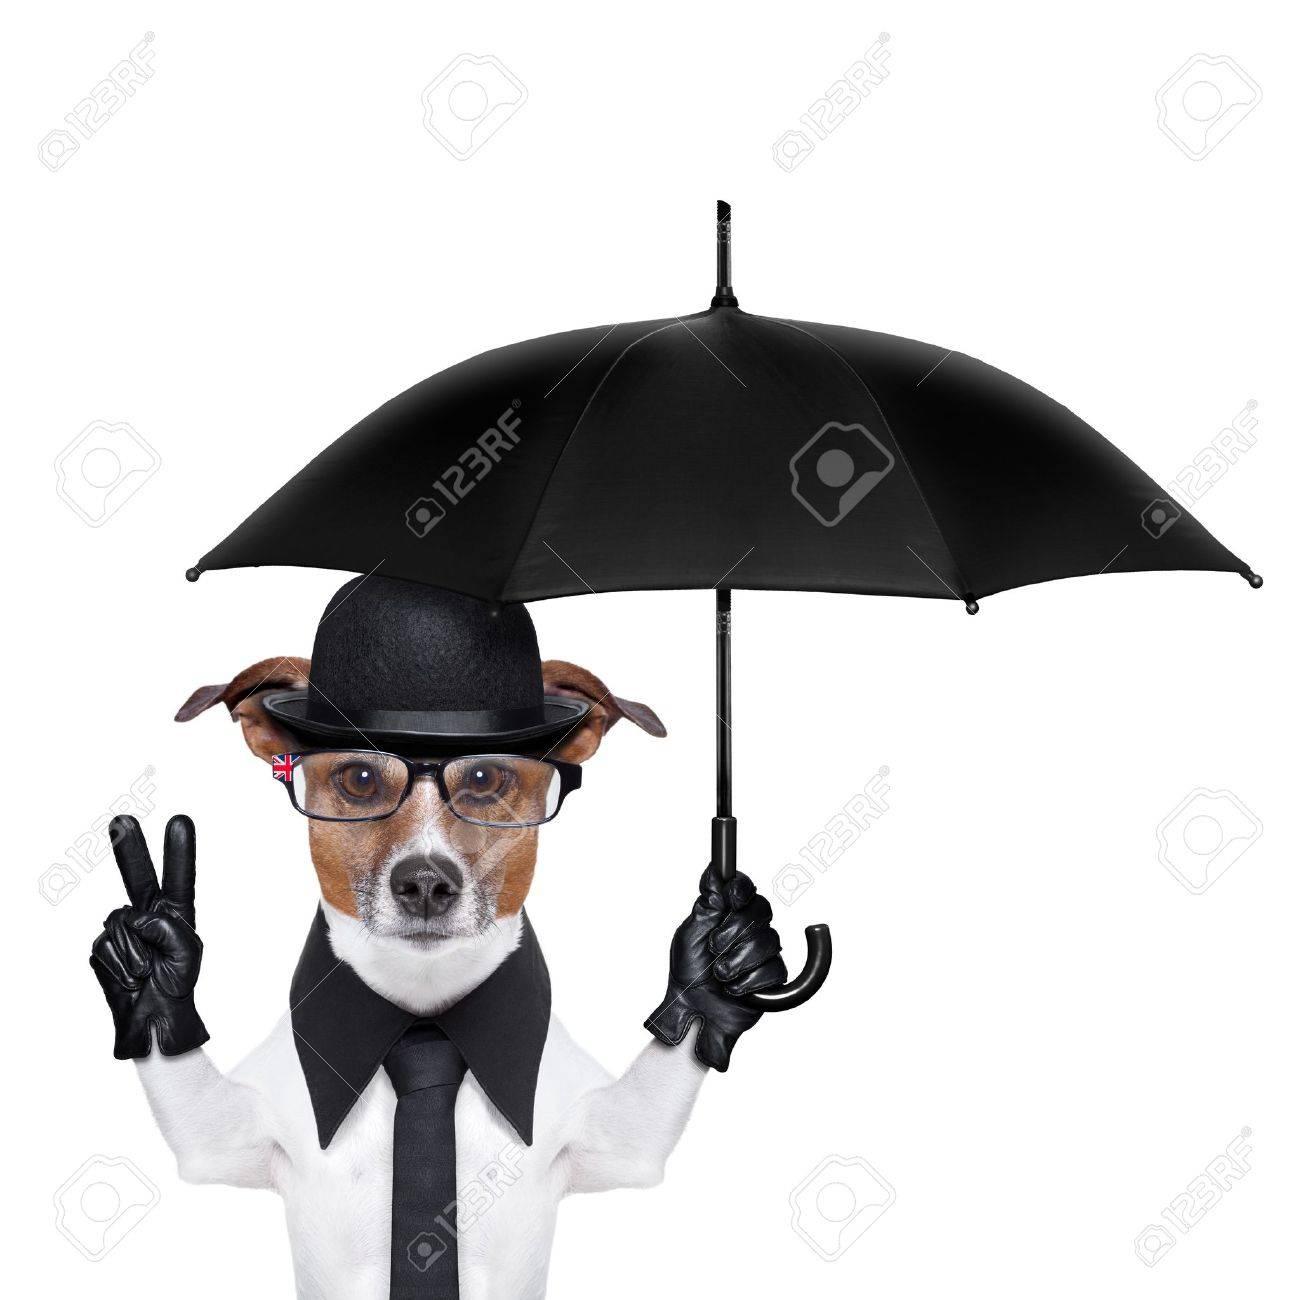 b804e36da3d82 british dog with black bowler hat and black suit holding am umbrella Stock  Photo - 19632475